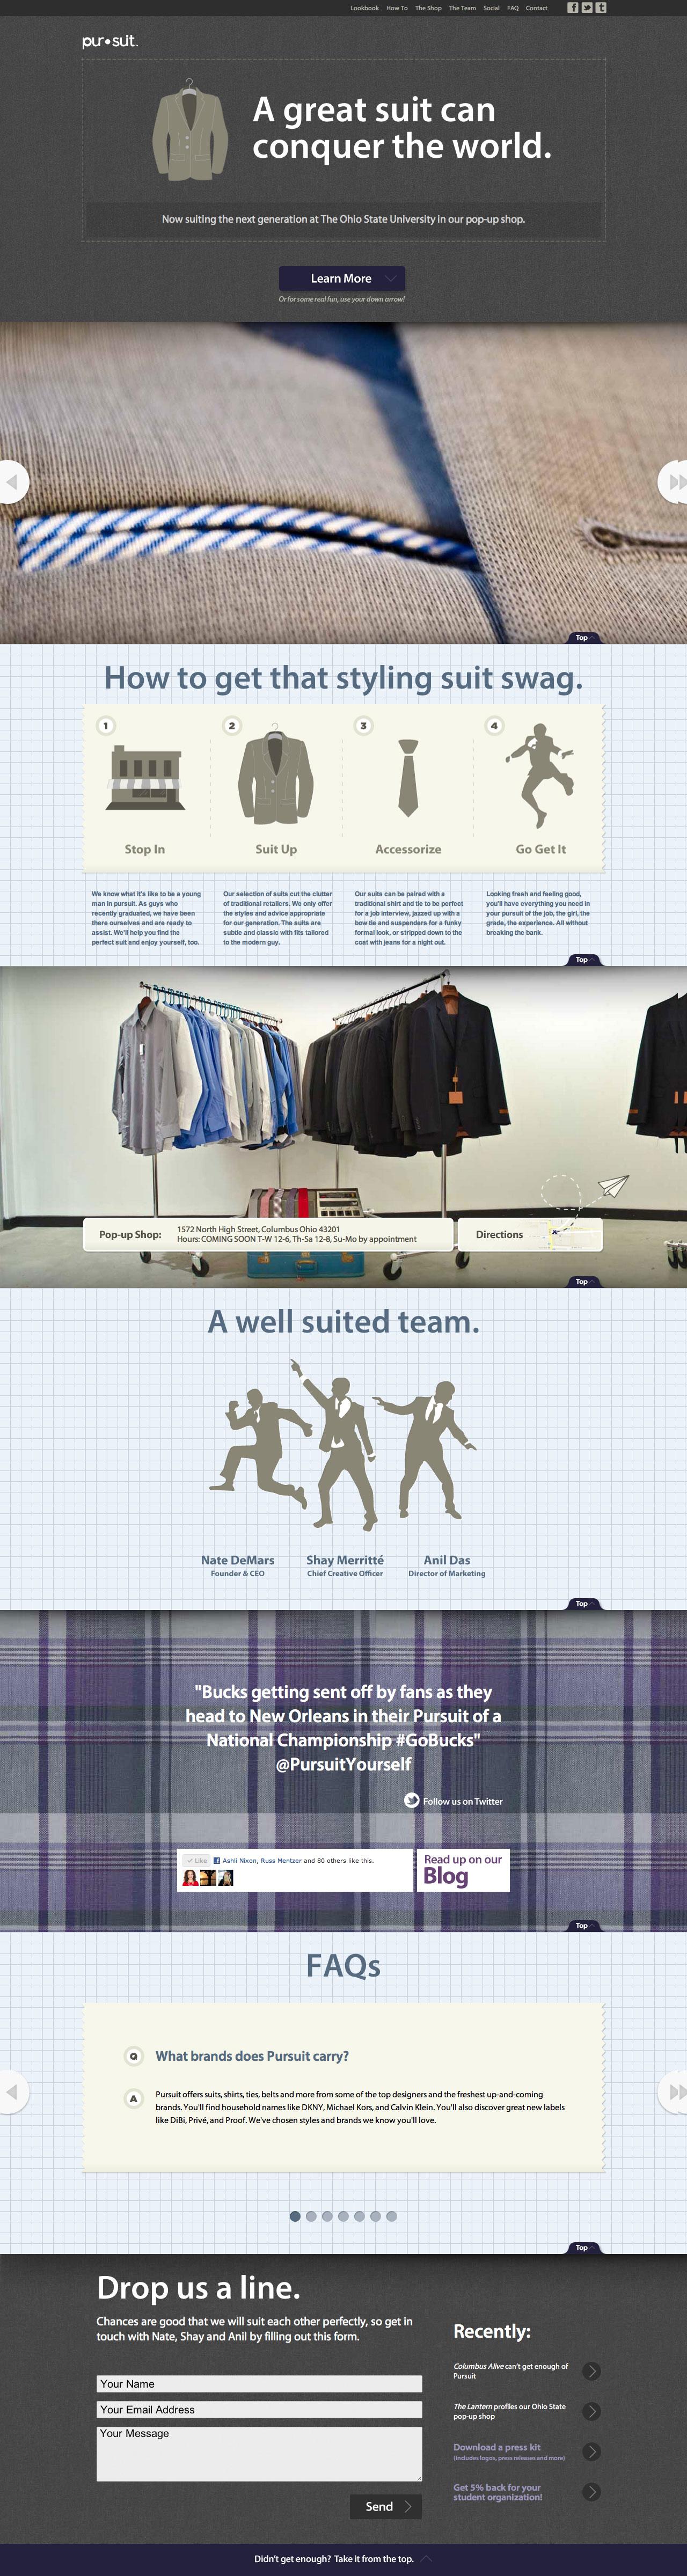 Pursuit Yourself Website Screenshot